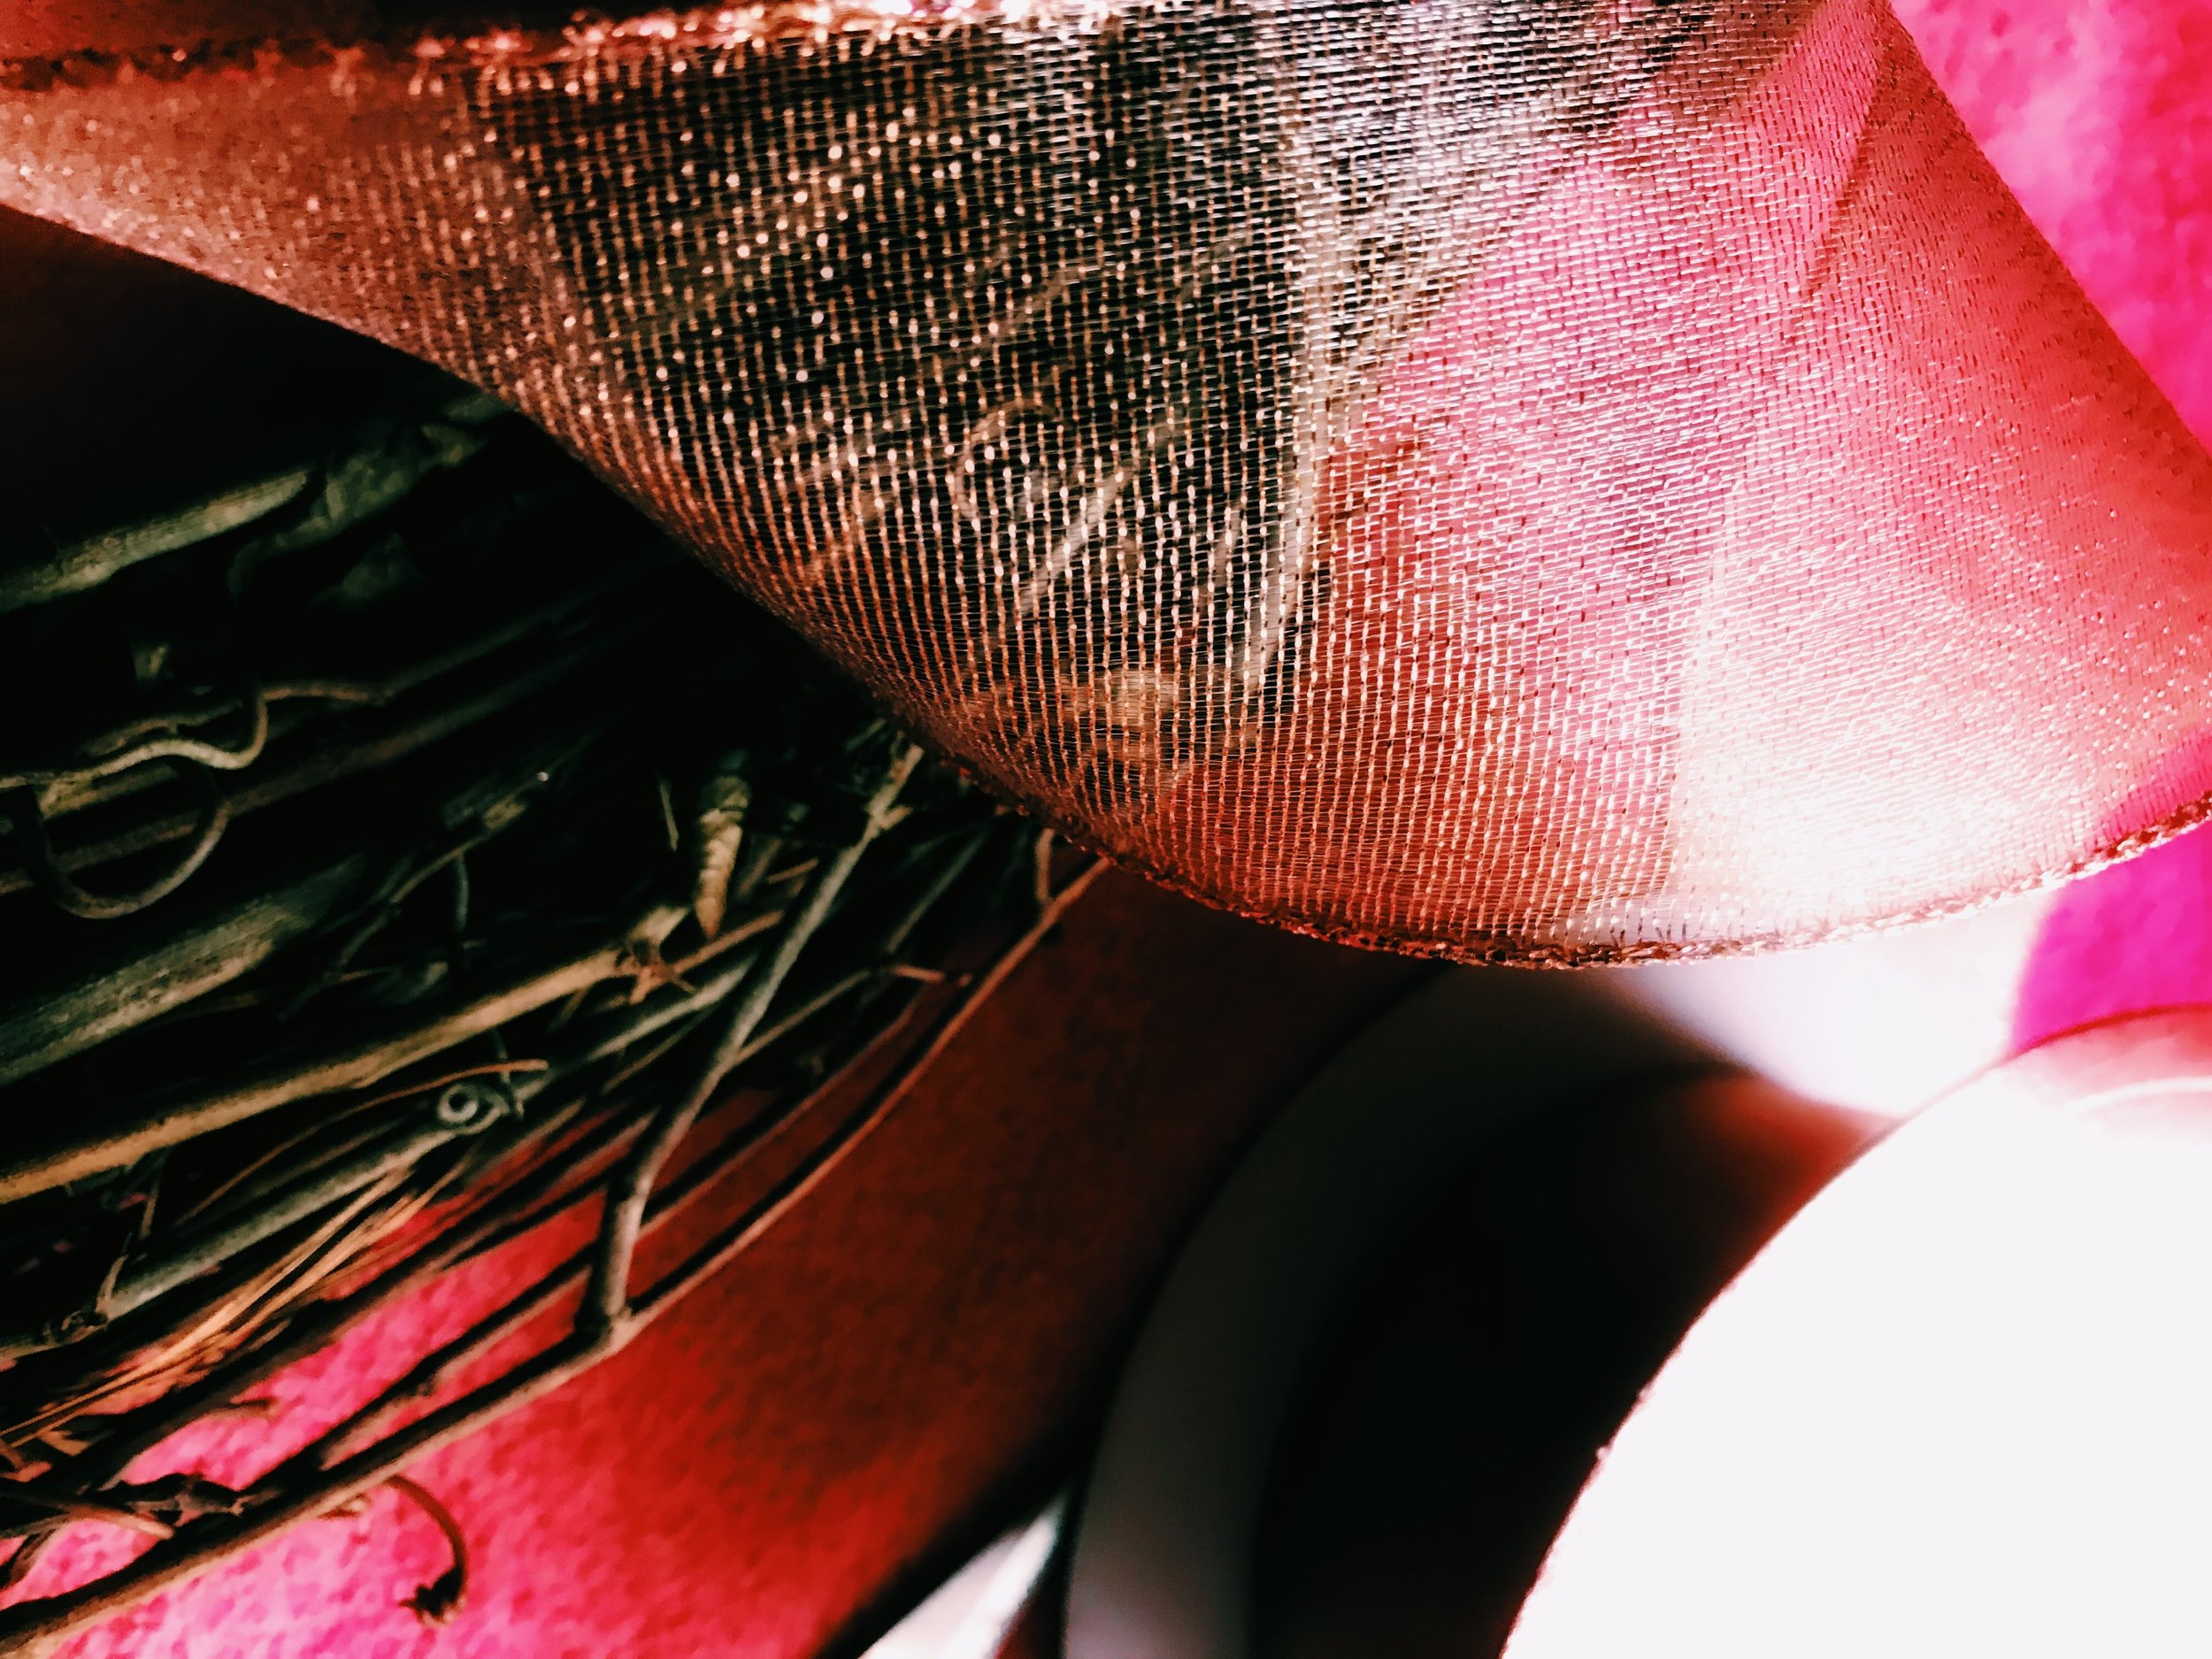 Three Heel Clicks - How to Make a Classy Holiday Wreath for $20 (18).jpg